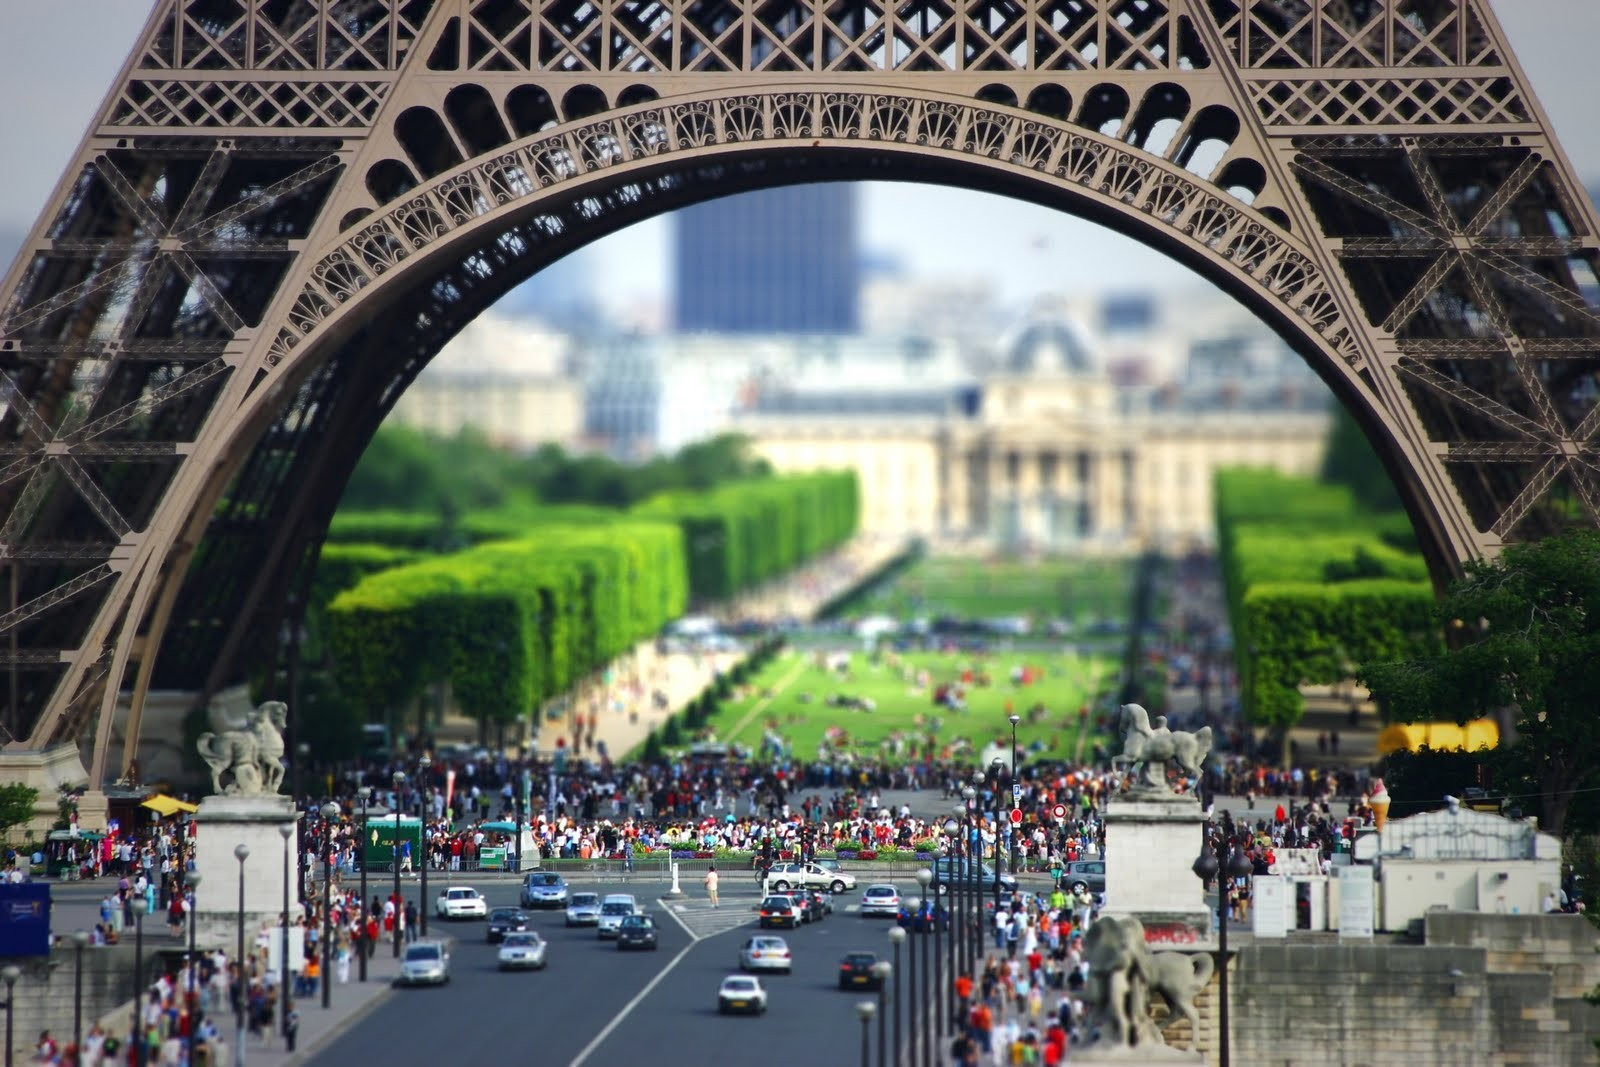 General 1600x1067 Paris Eiffel Tower tilt shift people cityscape traffic France